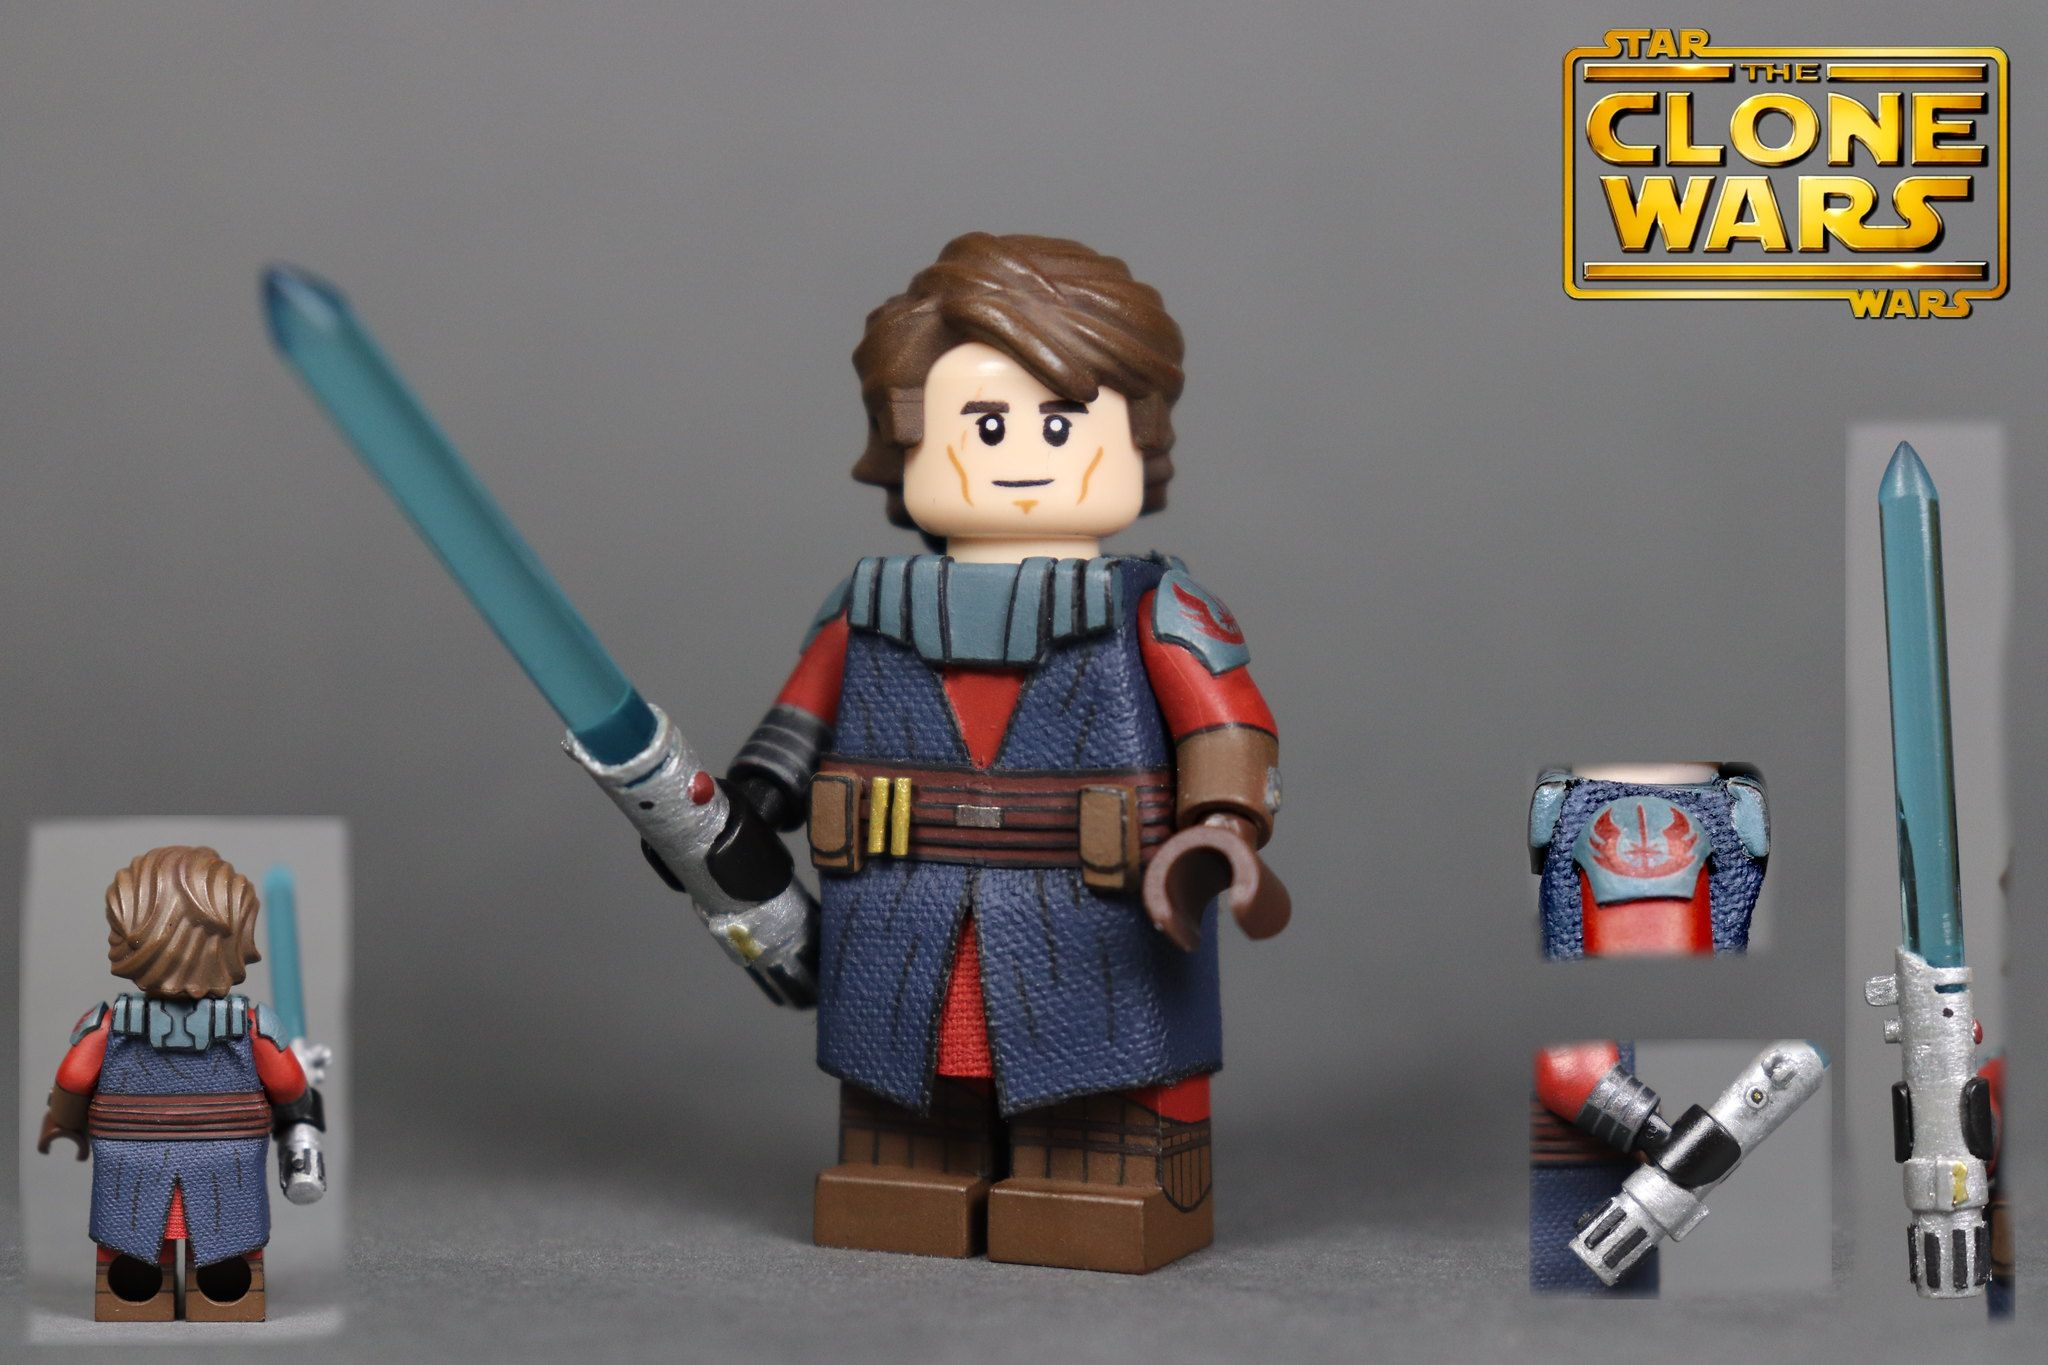 Custom Lego Star Wars The Clone Wars S1 Anakin Skywalker In 2020 Lego Star Wars Lego Star Wars Sets Custom Lego